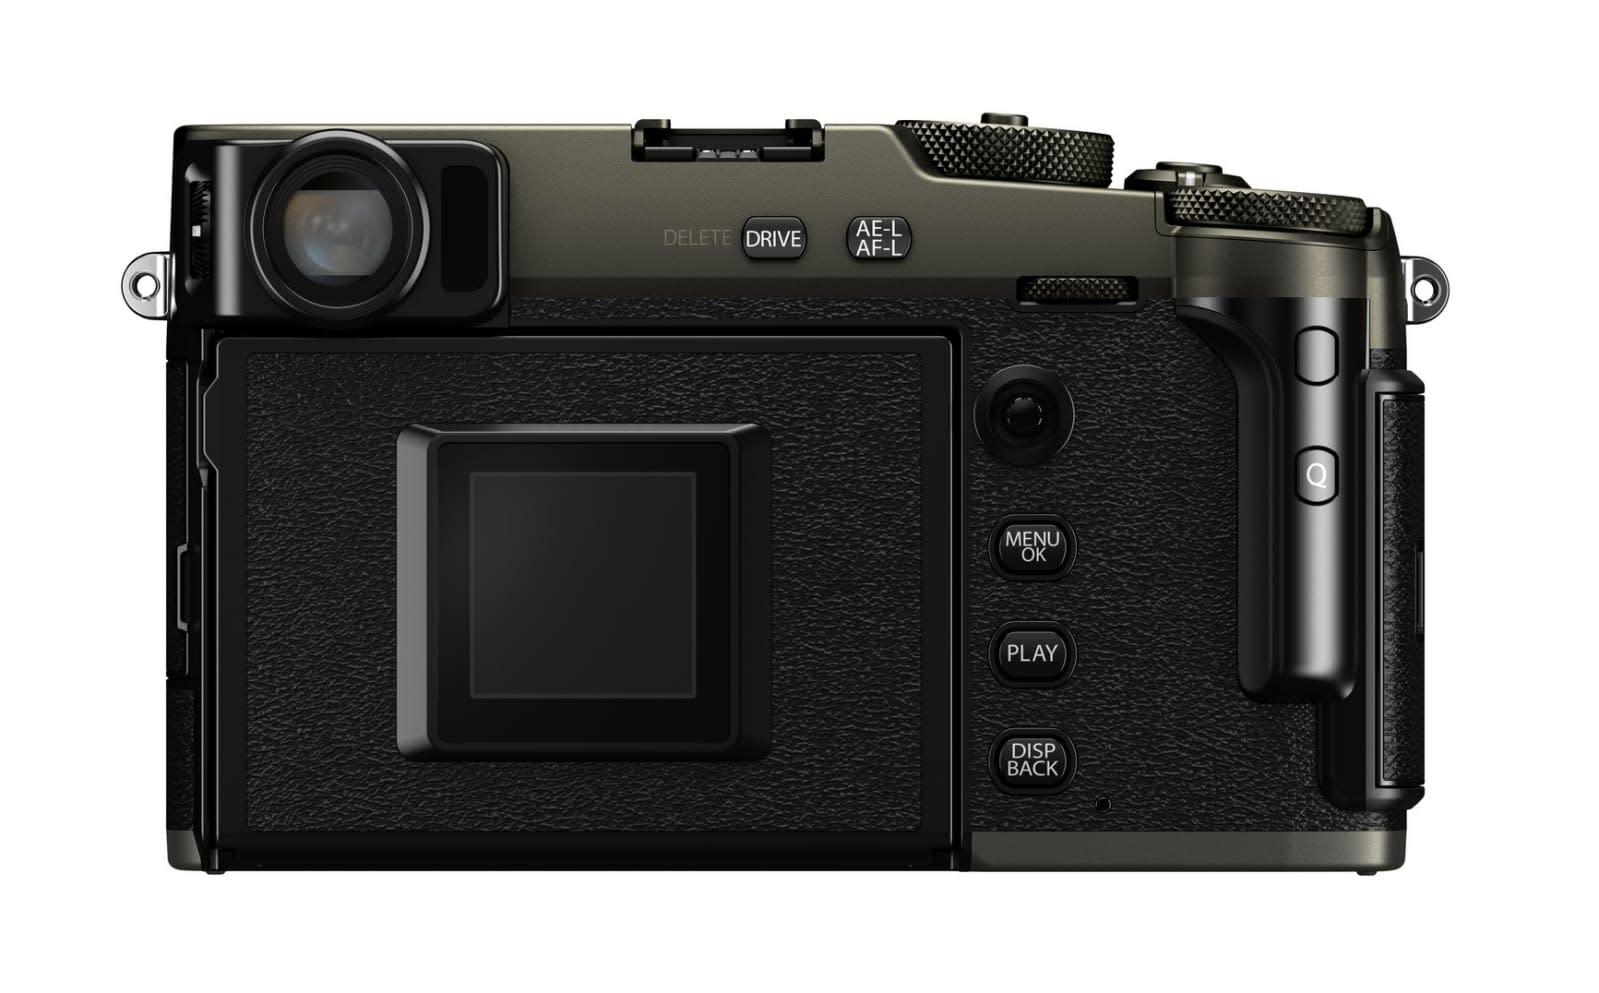 Fujifilm X-Pro3 APS-C Mirrorless Camera